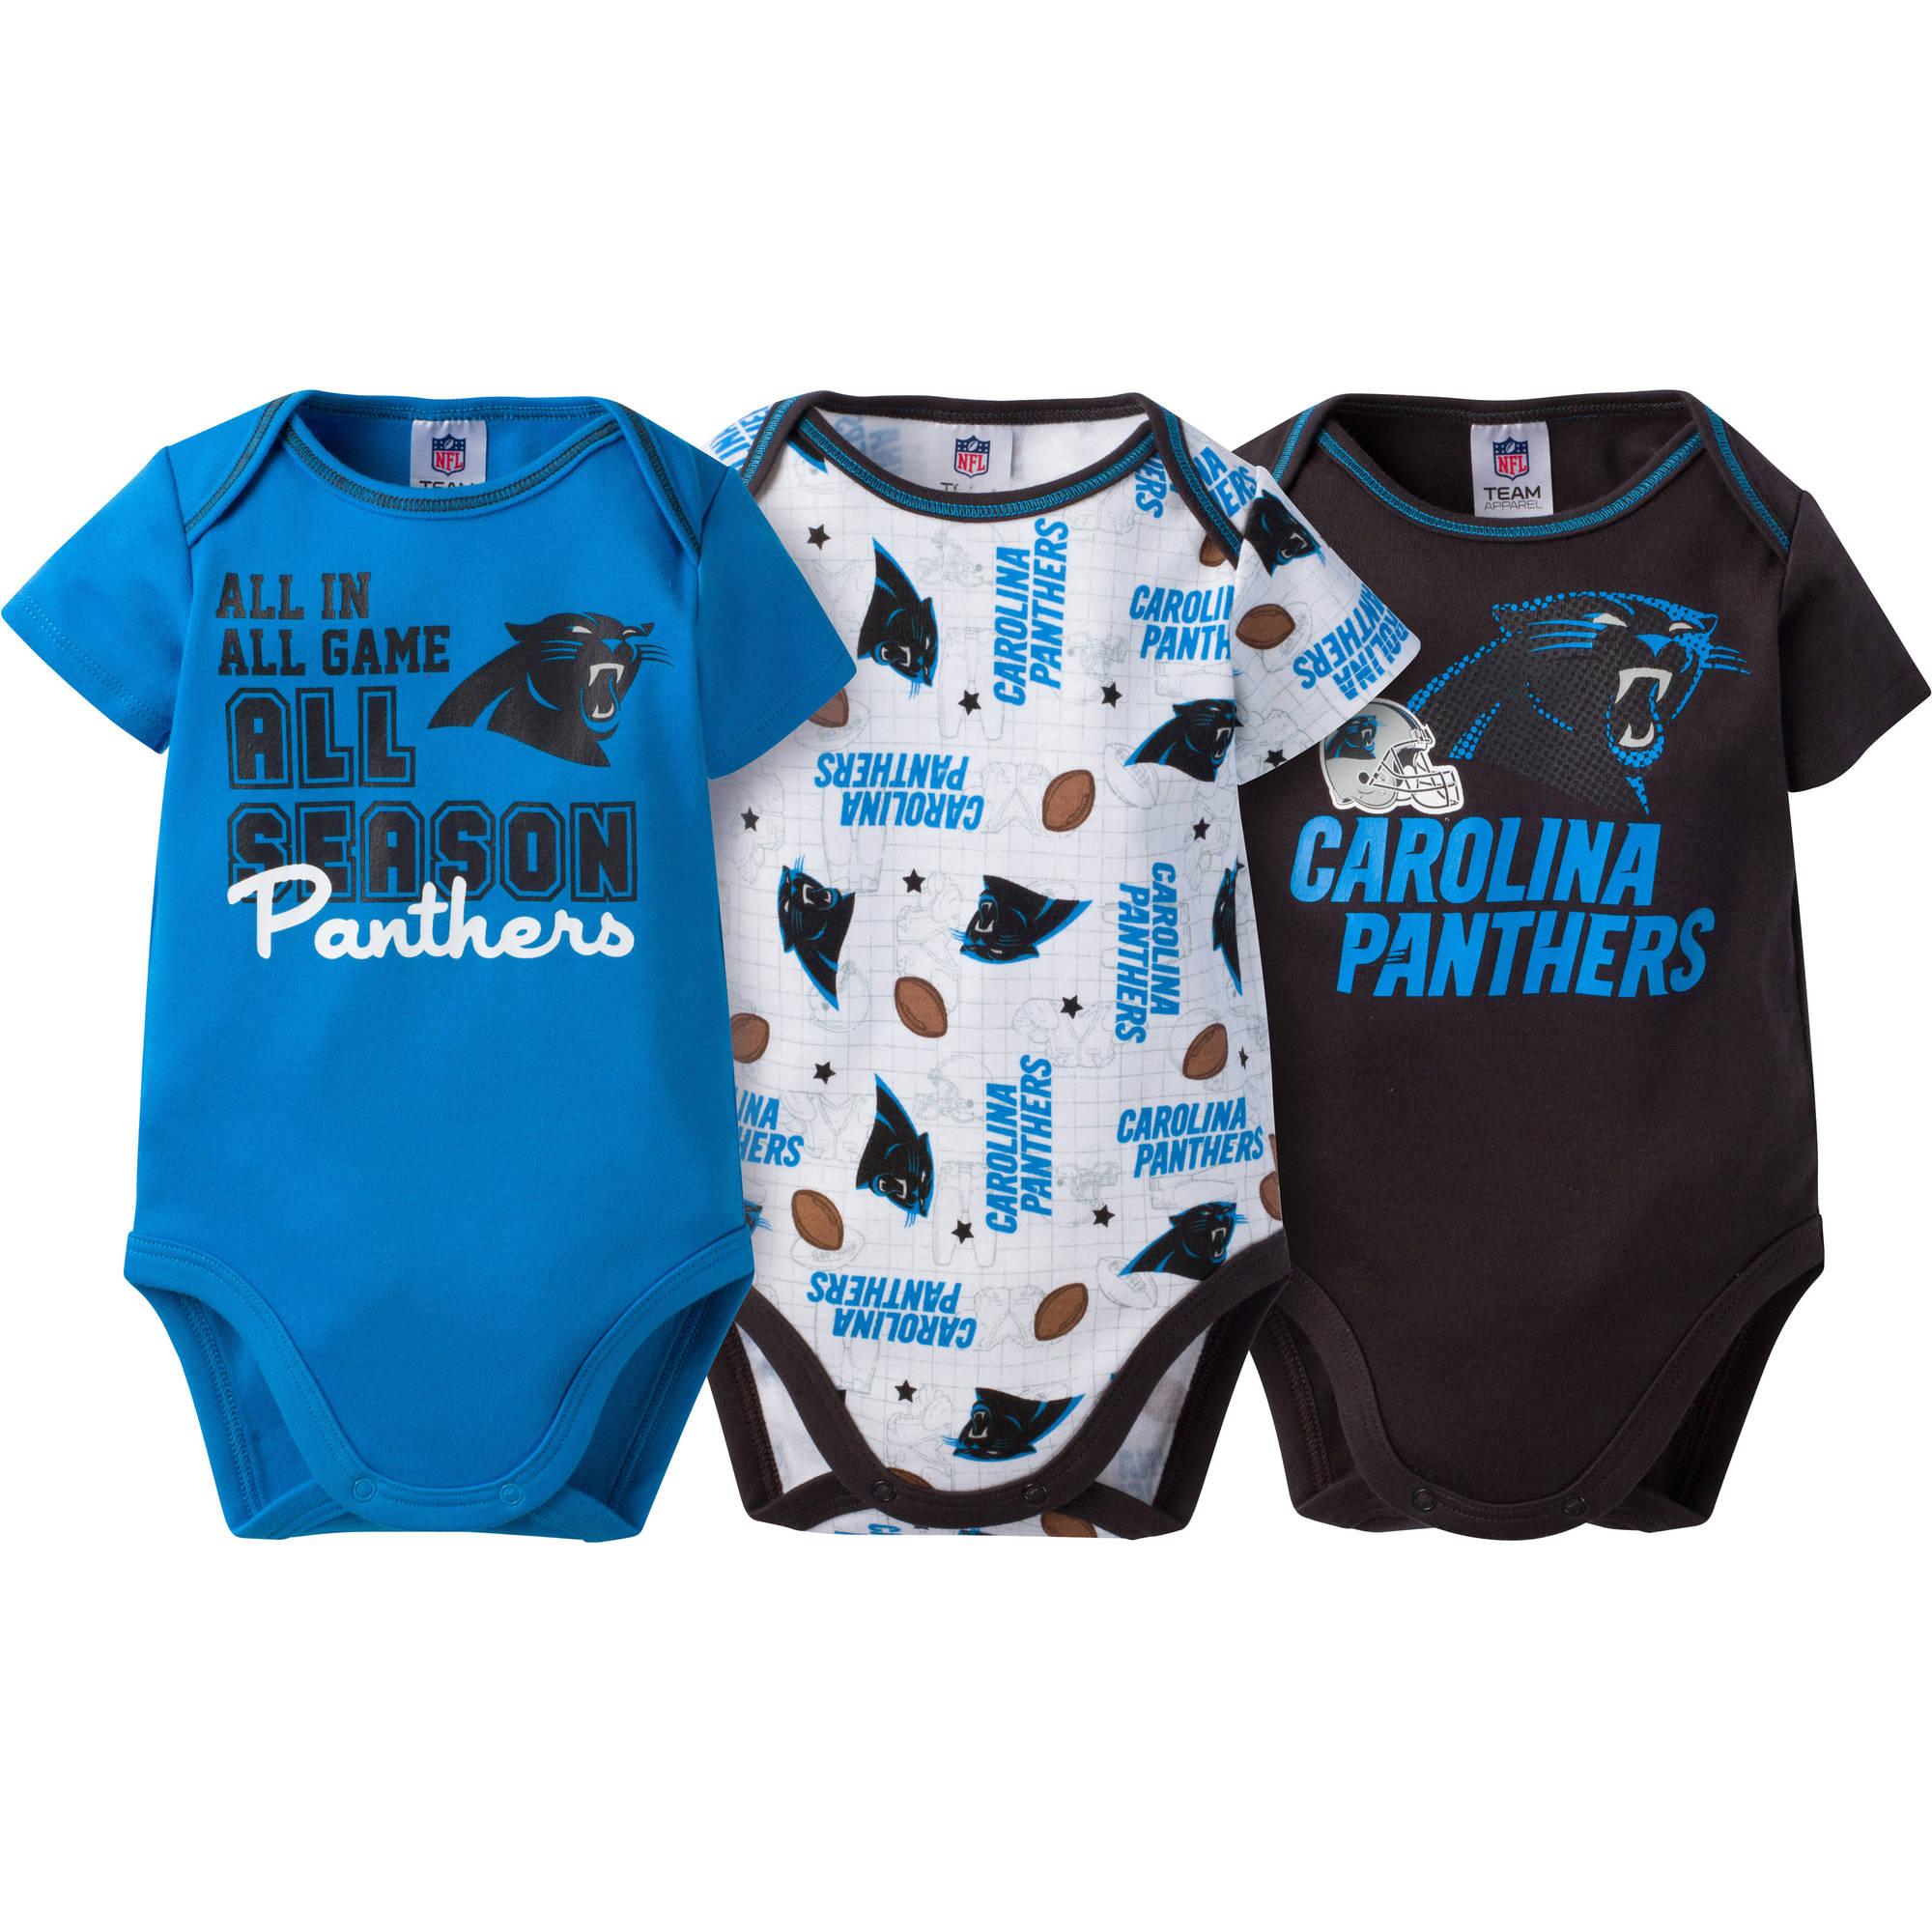 NFL Carolina Panthers Baby Boys Short Sleeve Bodysuit Set, 3-Pack